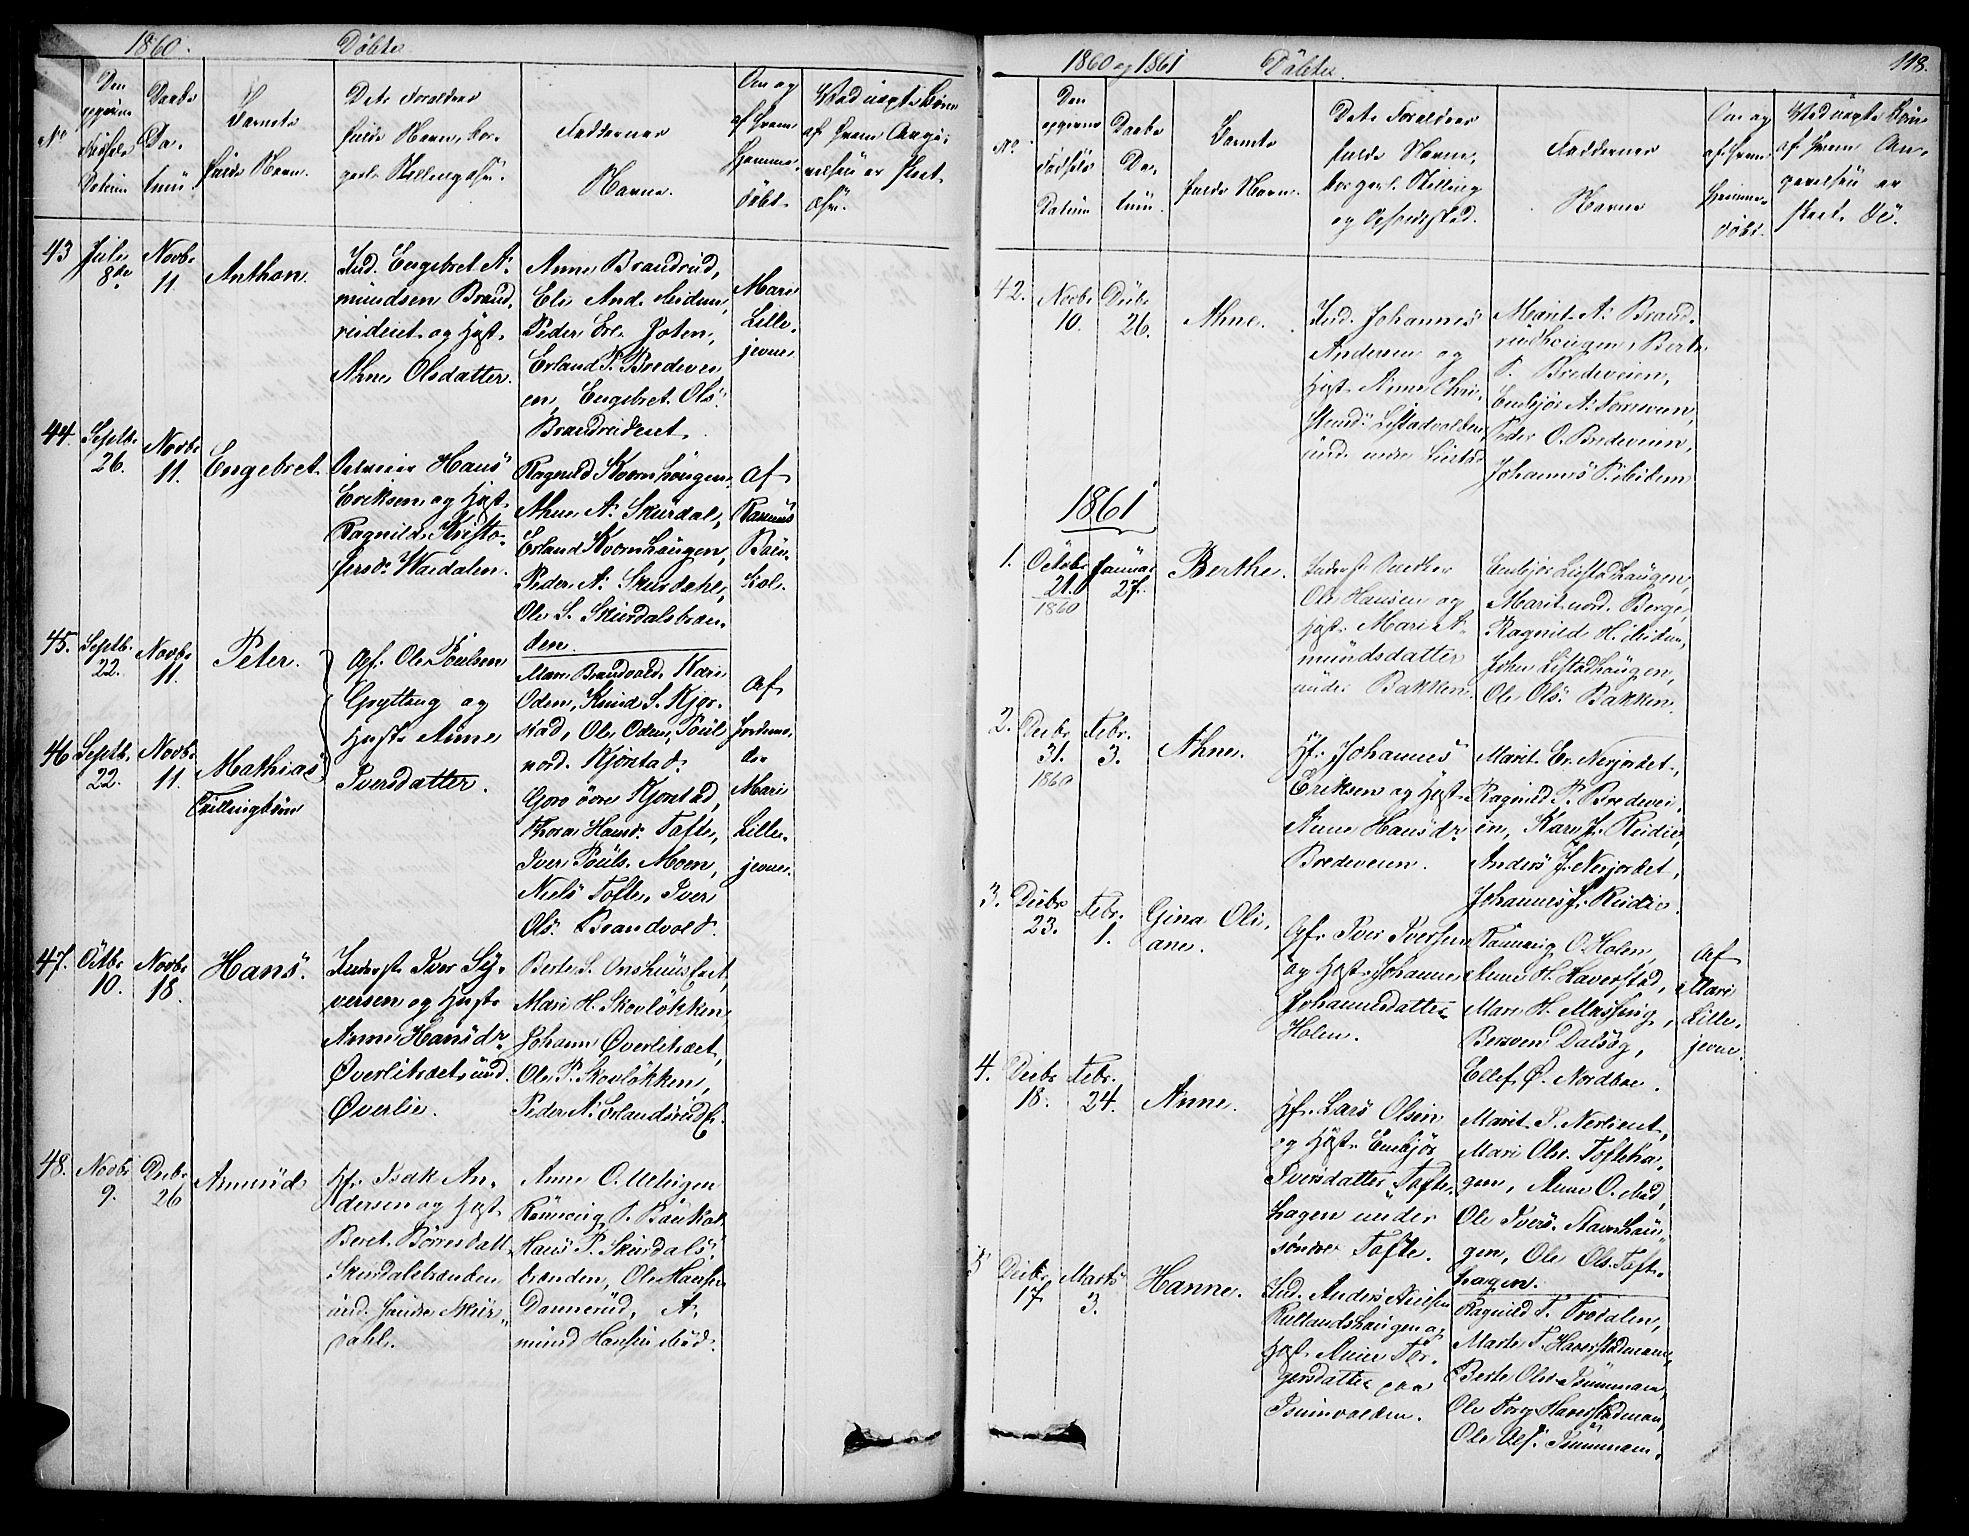 SAH, Sør-Fron prestekontor, H/Ha/Hab/L0001: Klokkerbok nr. 1, 1844-1863, s. 118